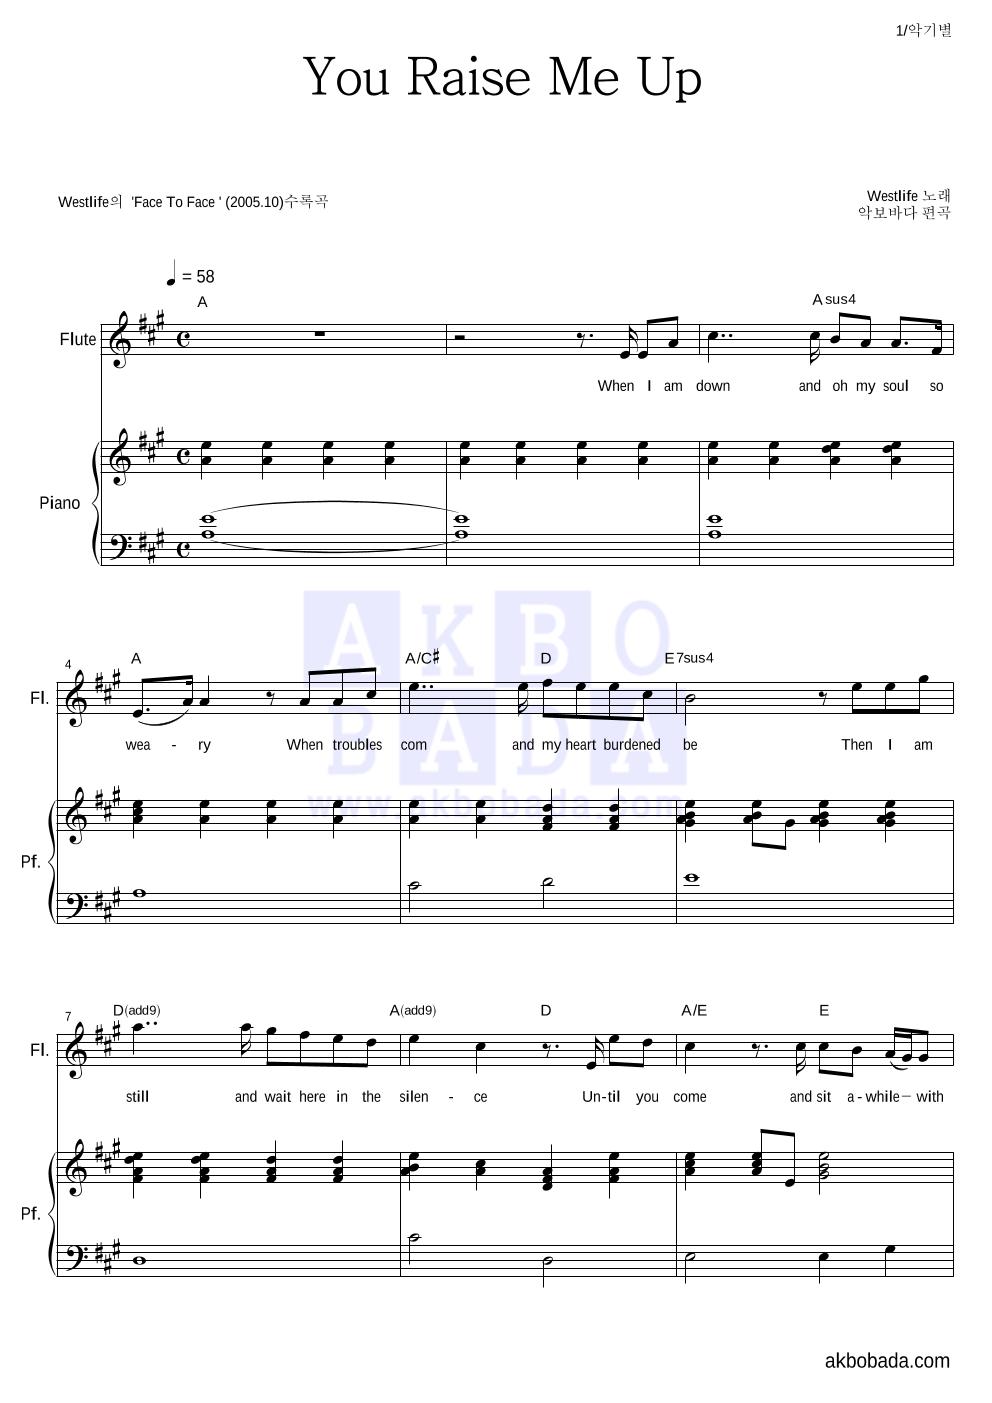 Westlife - You Raise Me Up 플룻&피아노 악보